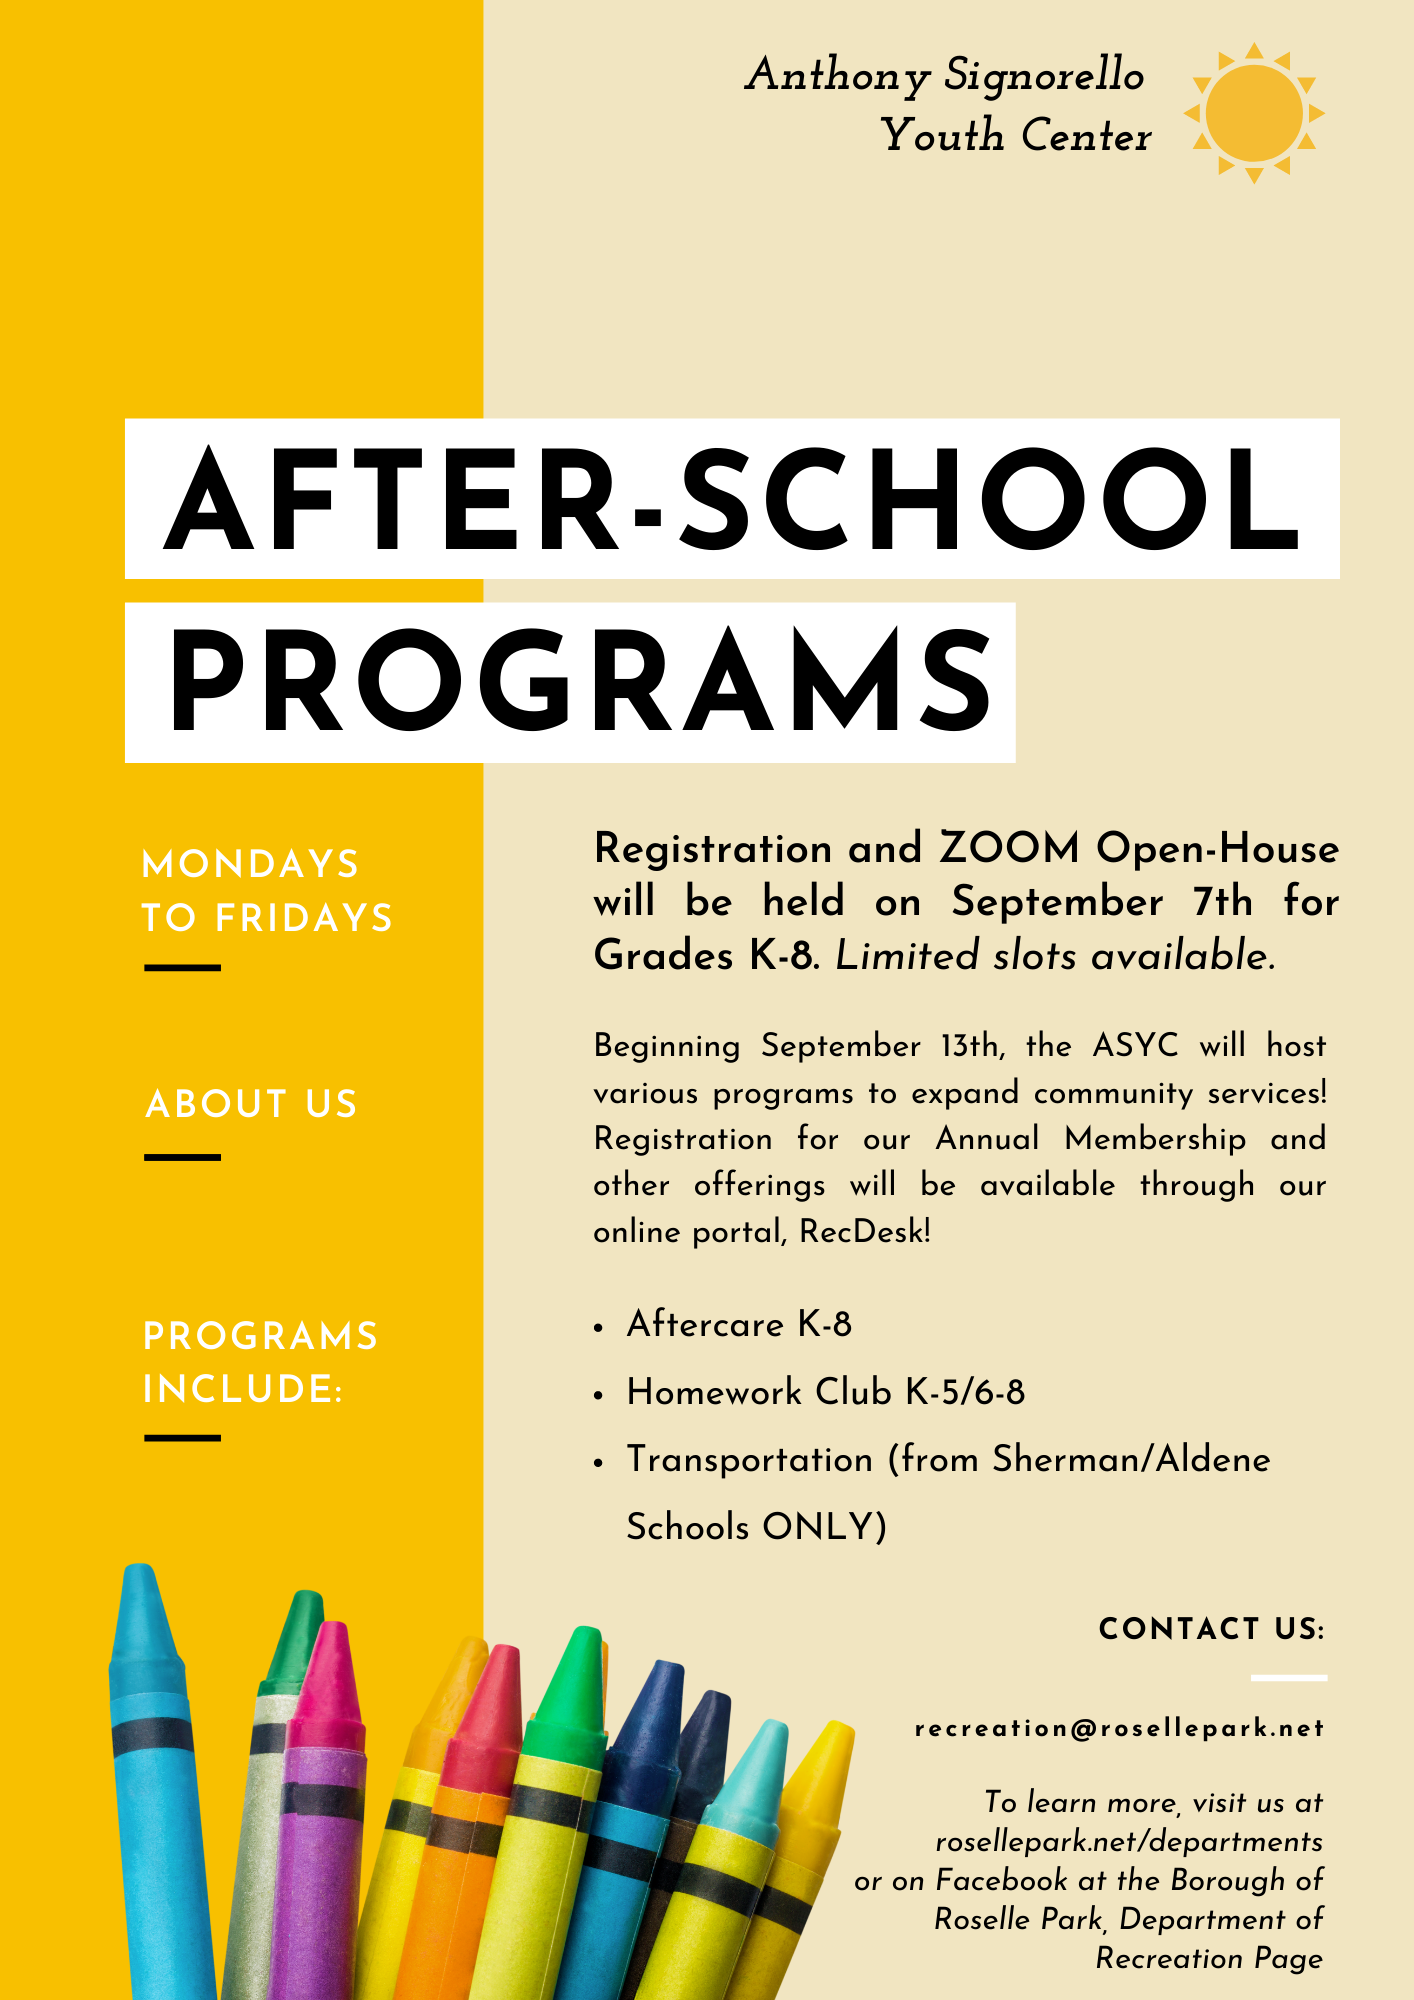 After-School Programs